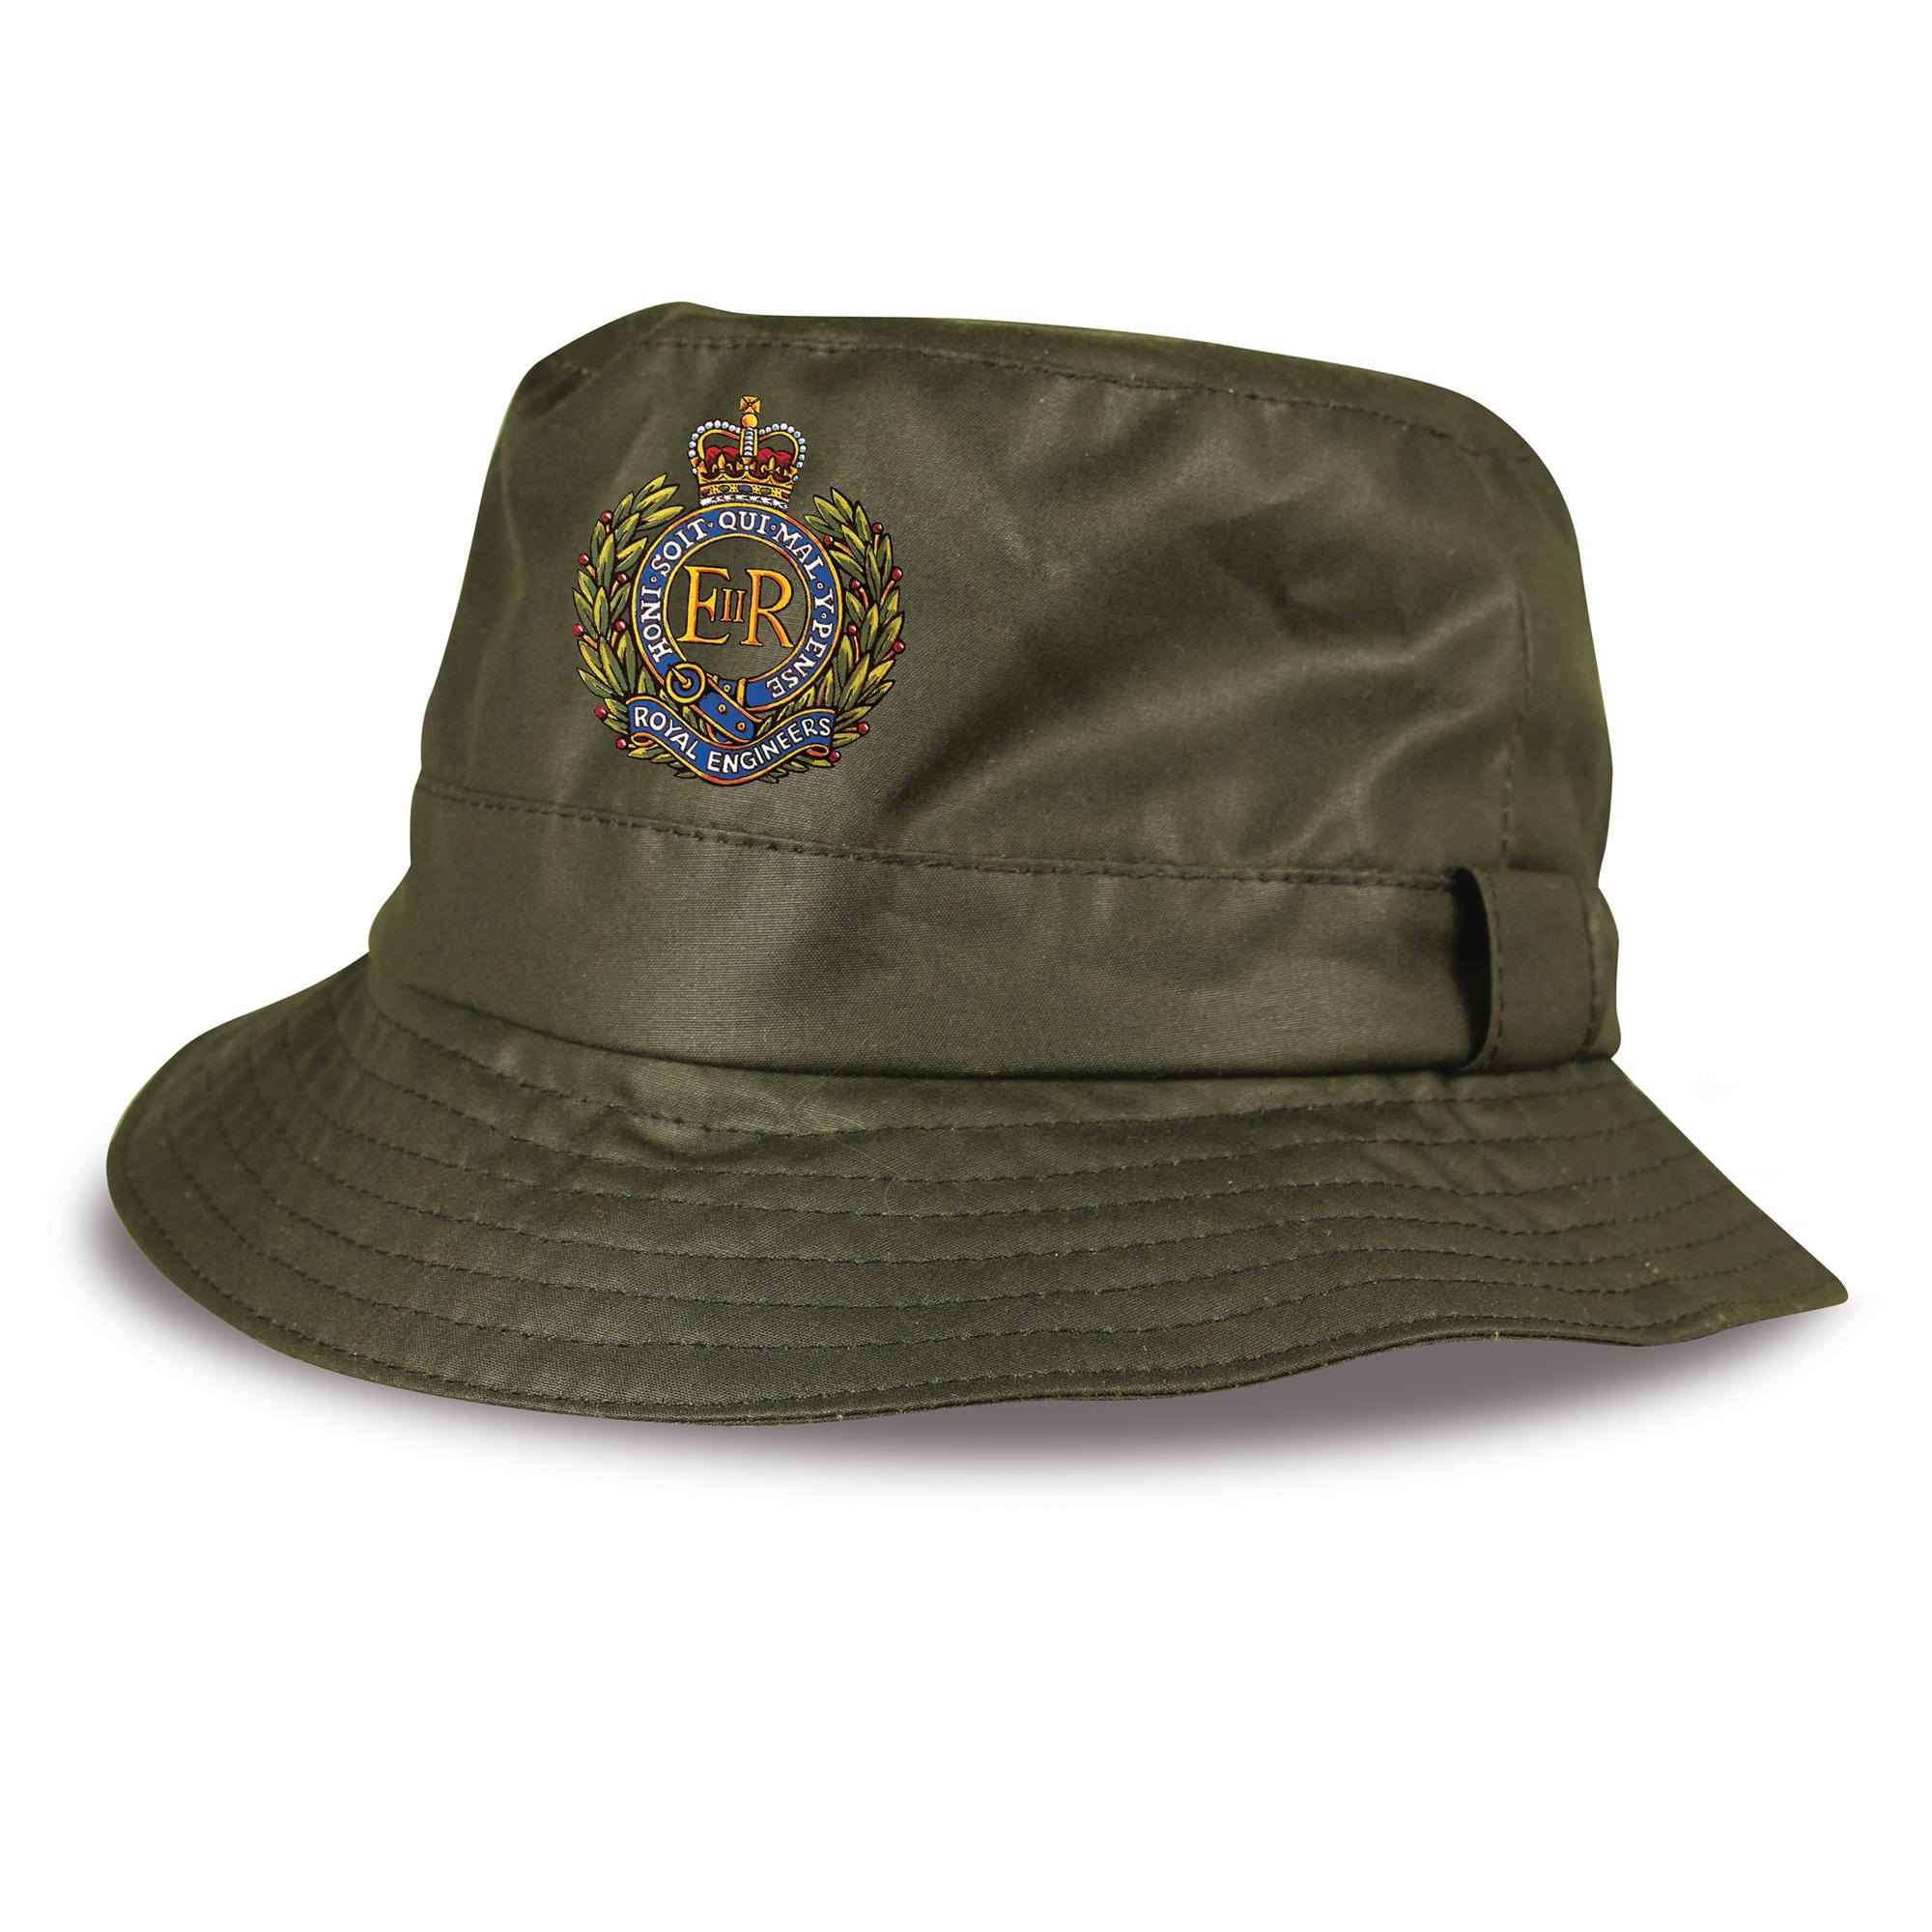 Personalised Bush Hats